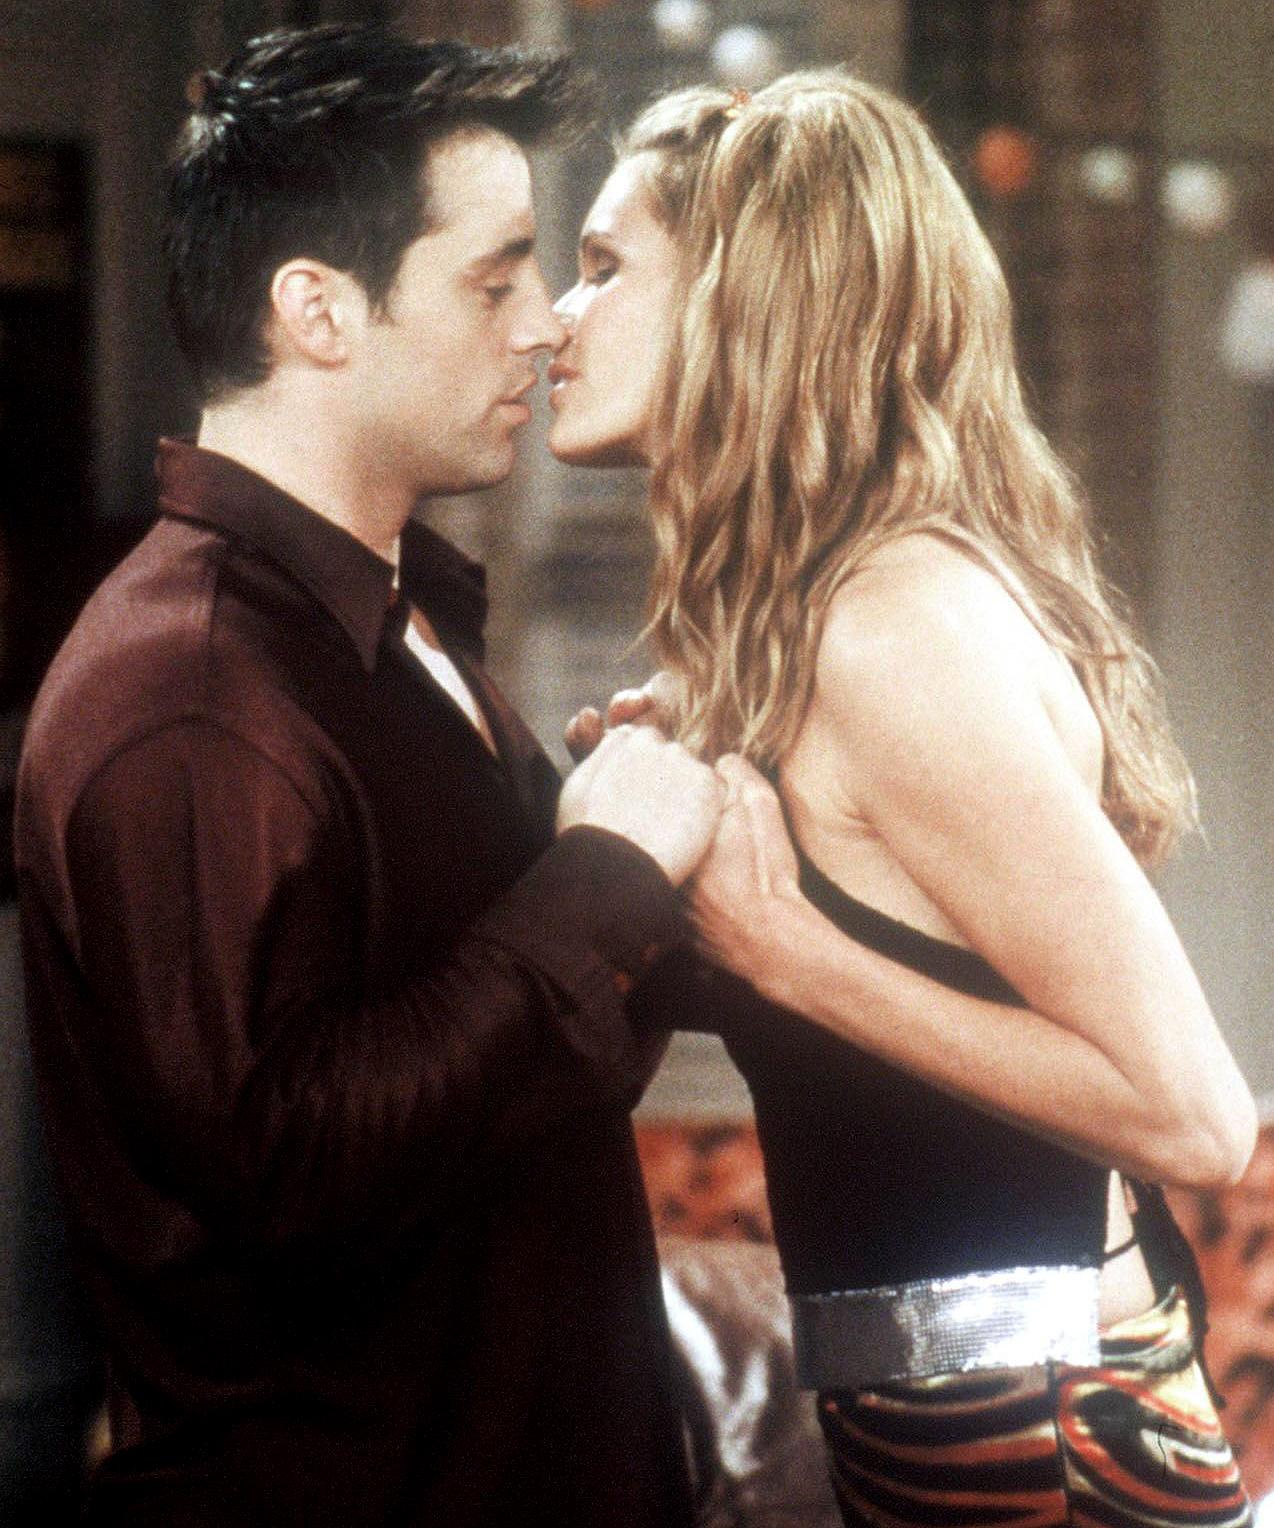 Matt LeBlanc and Elle Macpherson on 'Friends.'